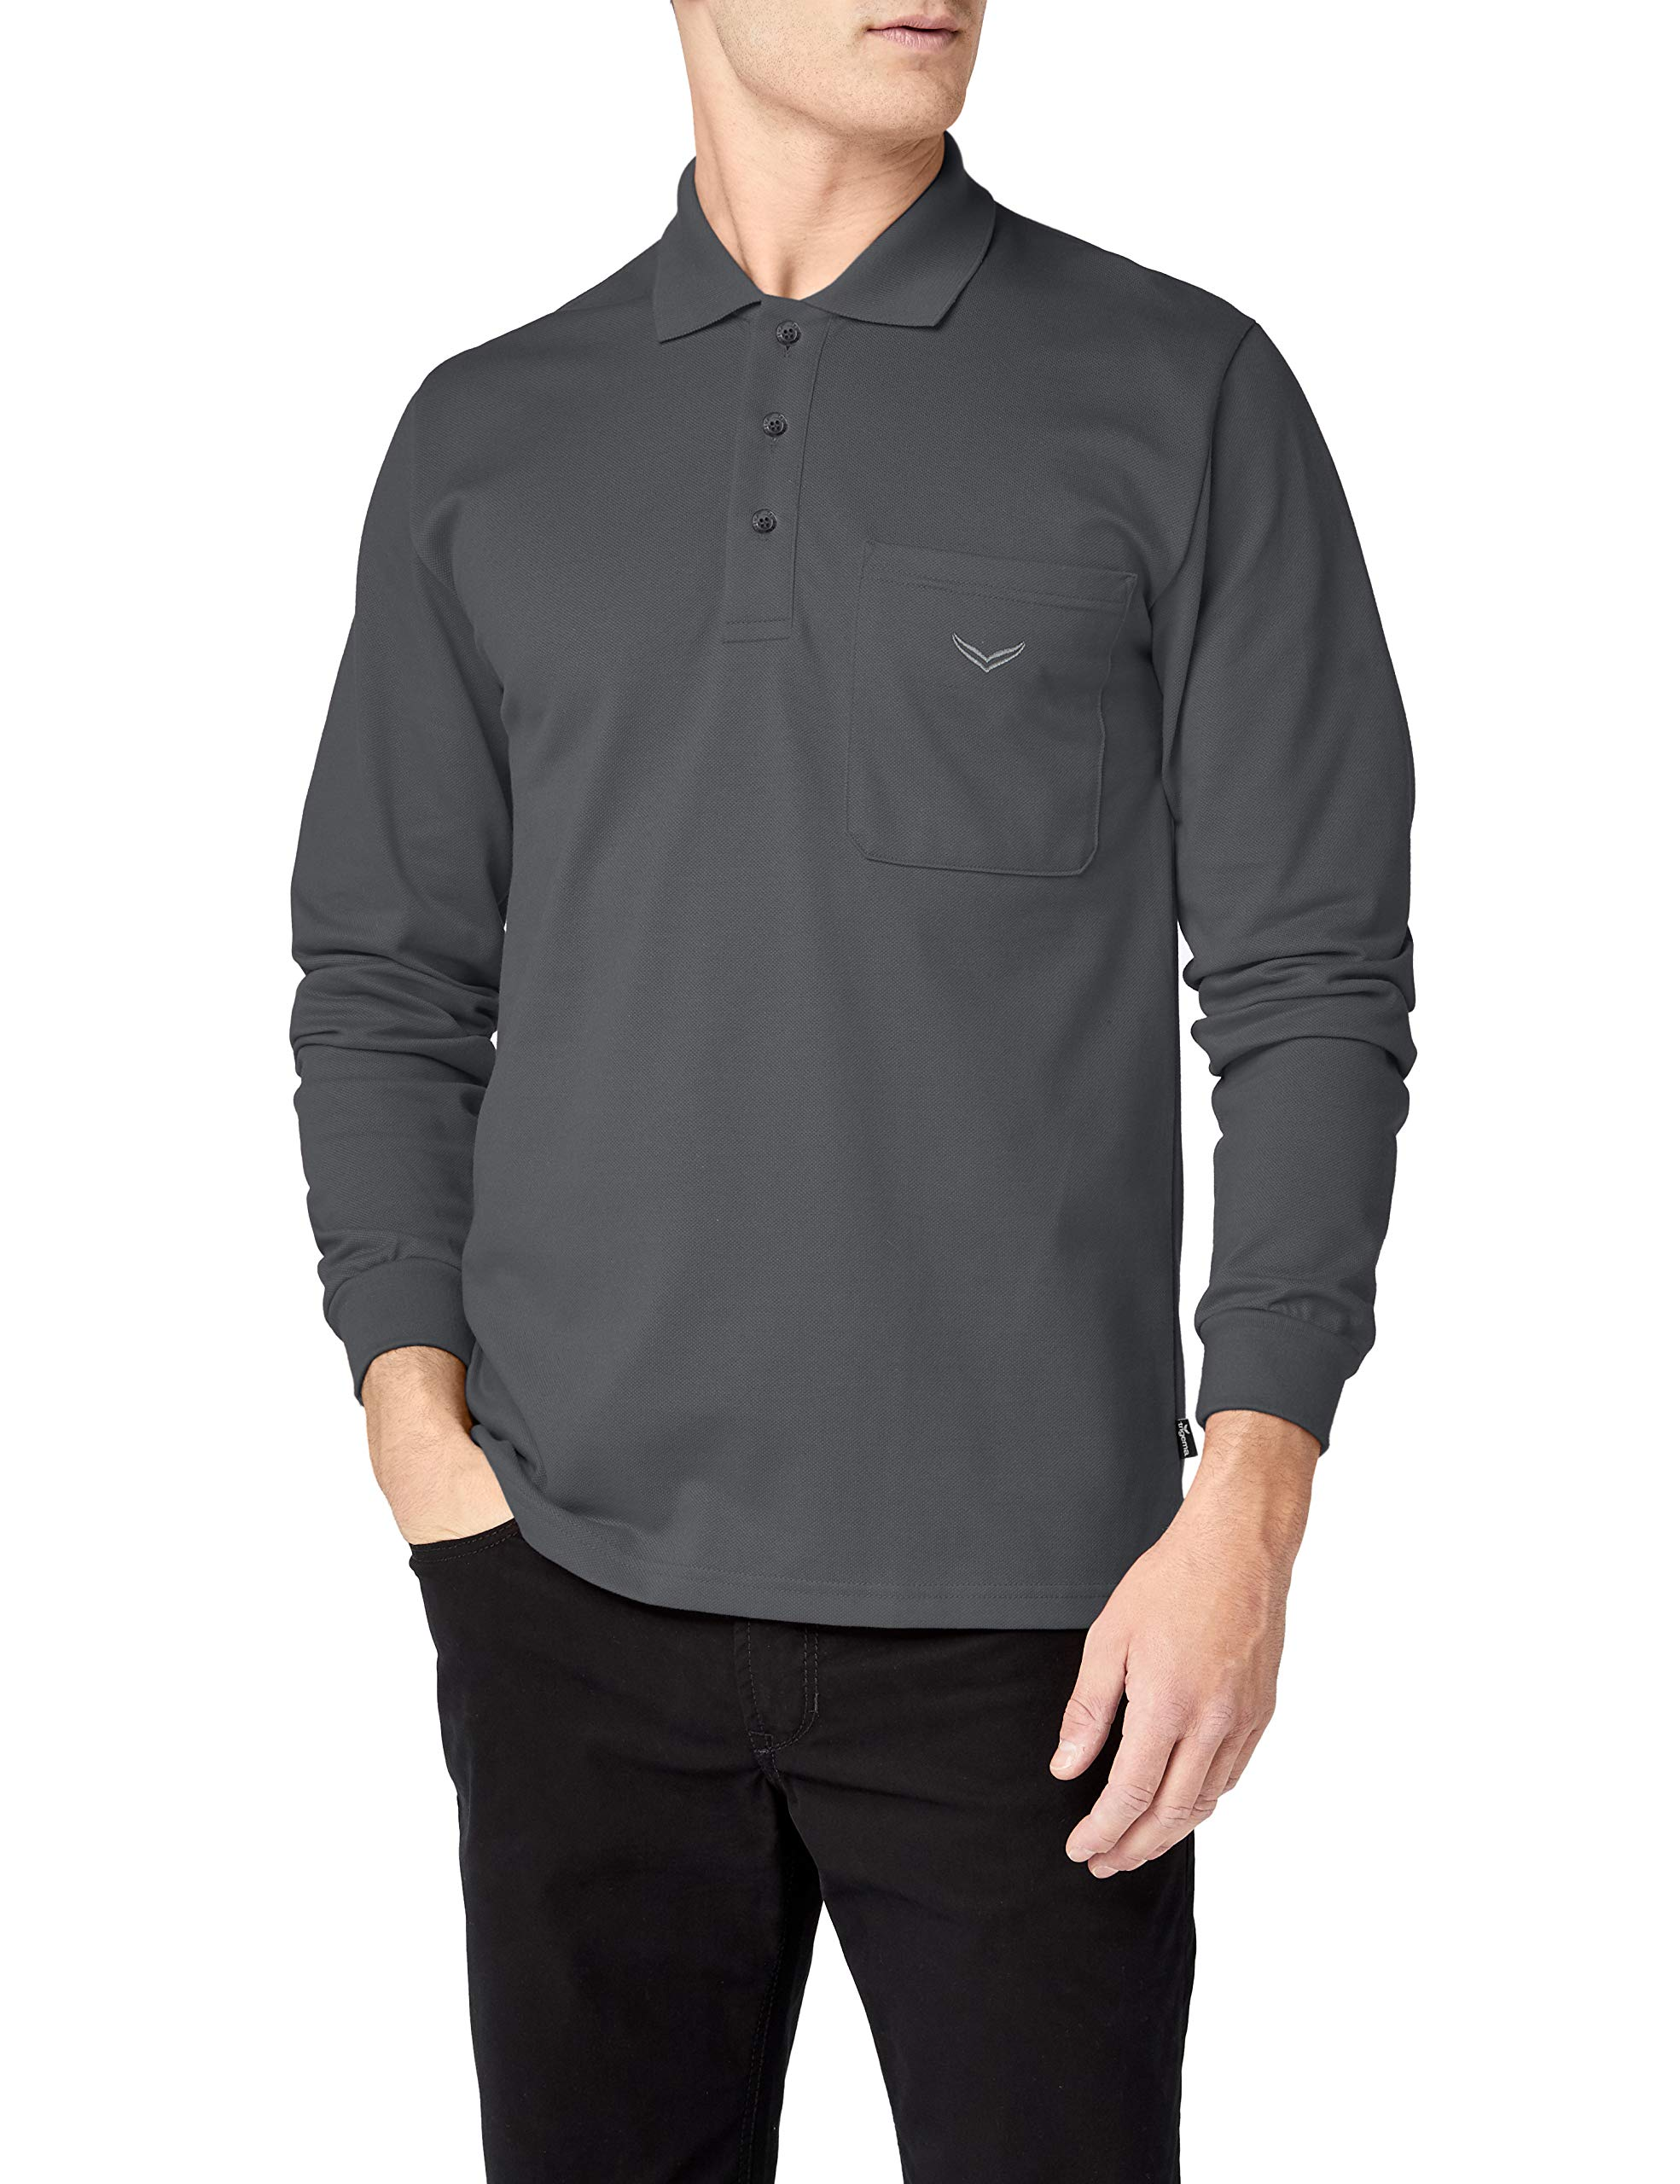 Trigema Homme Polo 018Xxl Grisanthrazit Langarm shirt wn0N8vm